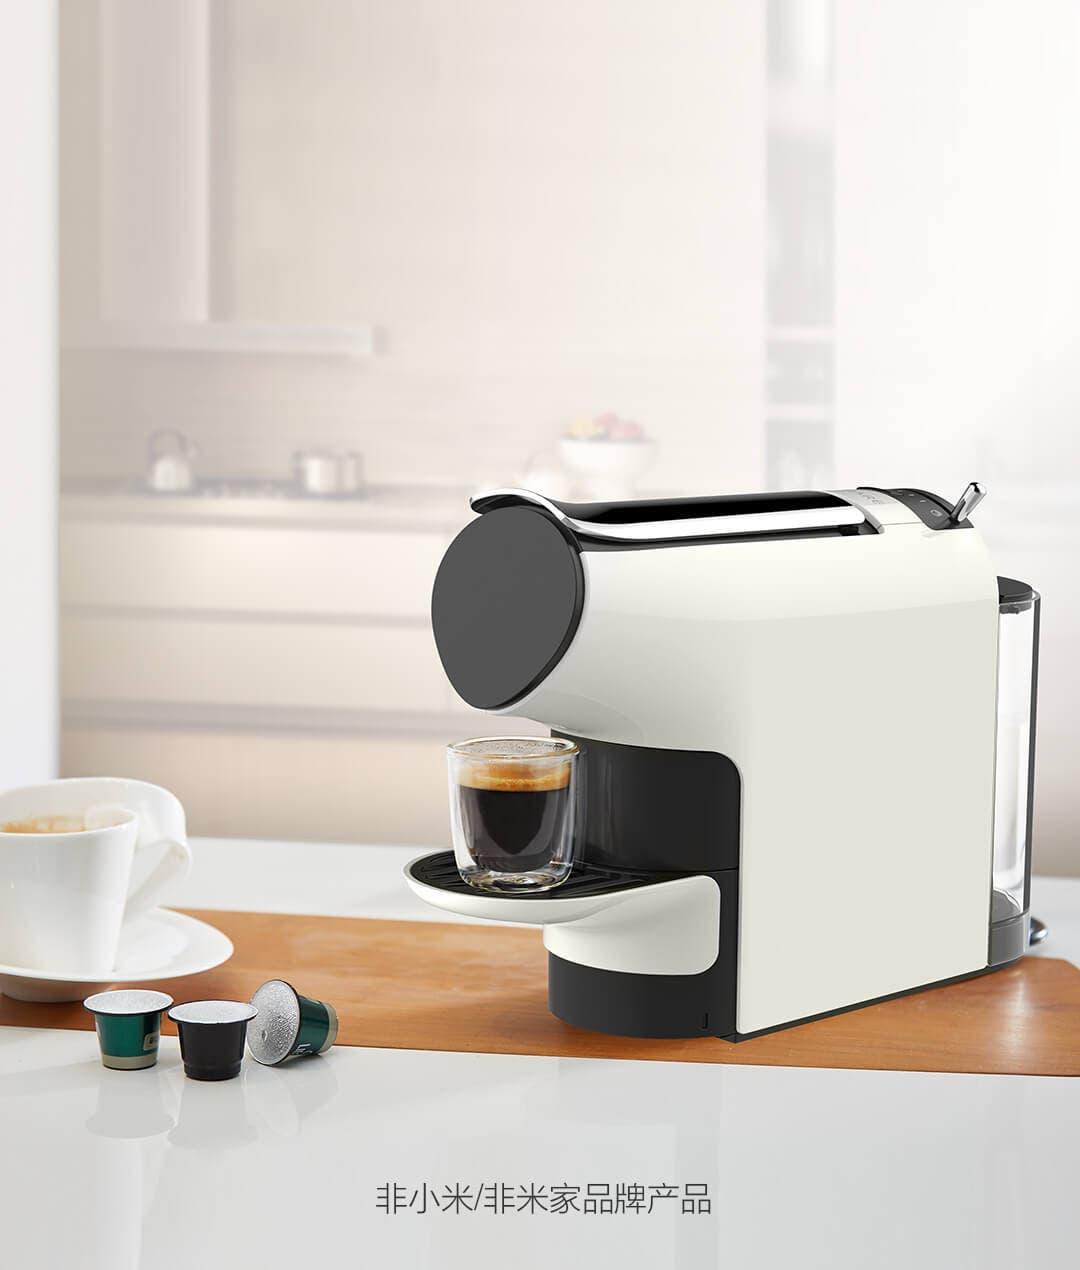 Coffee Maker Xiaomi : Xiaomi present Scishare Coffee Machine - Gizchina.com